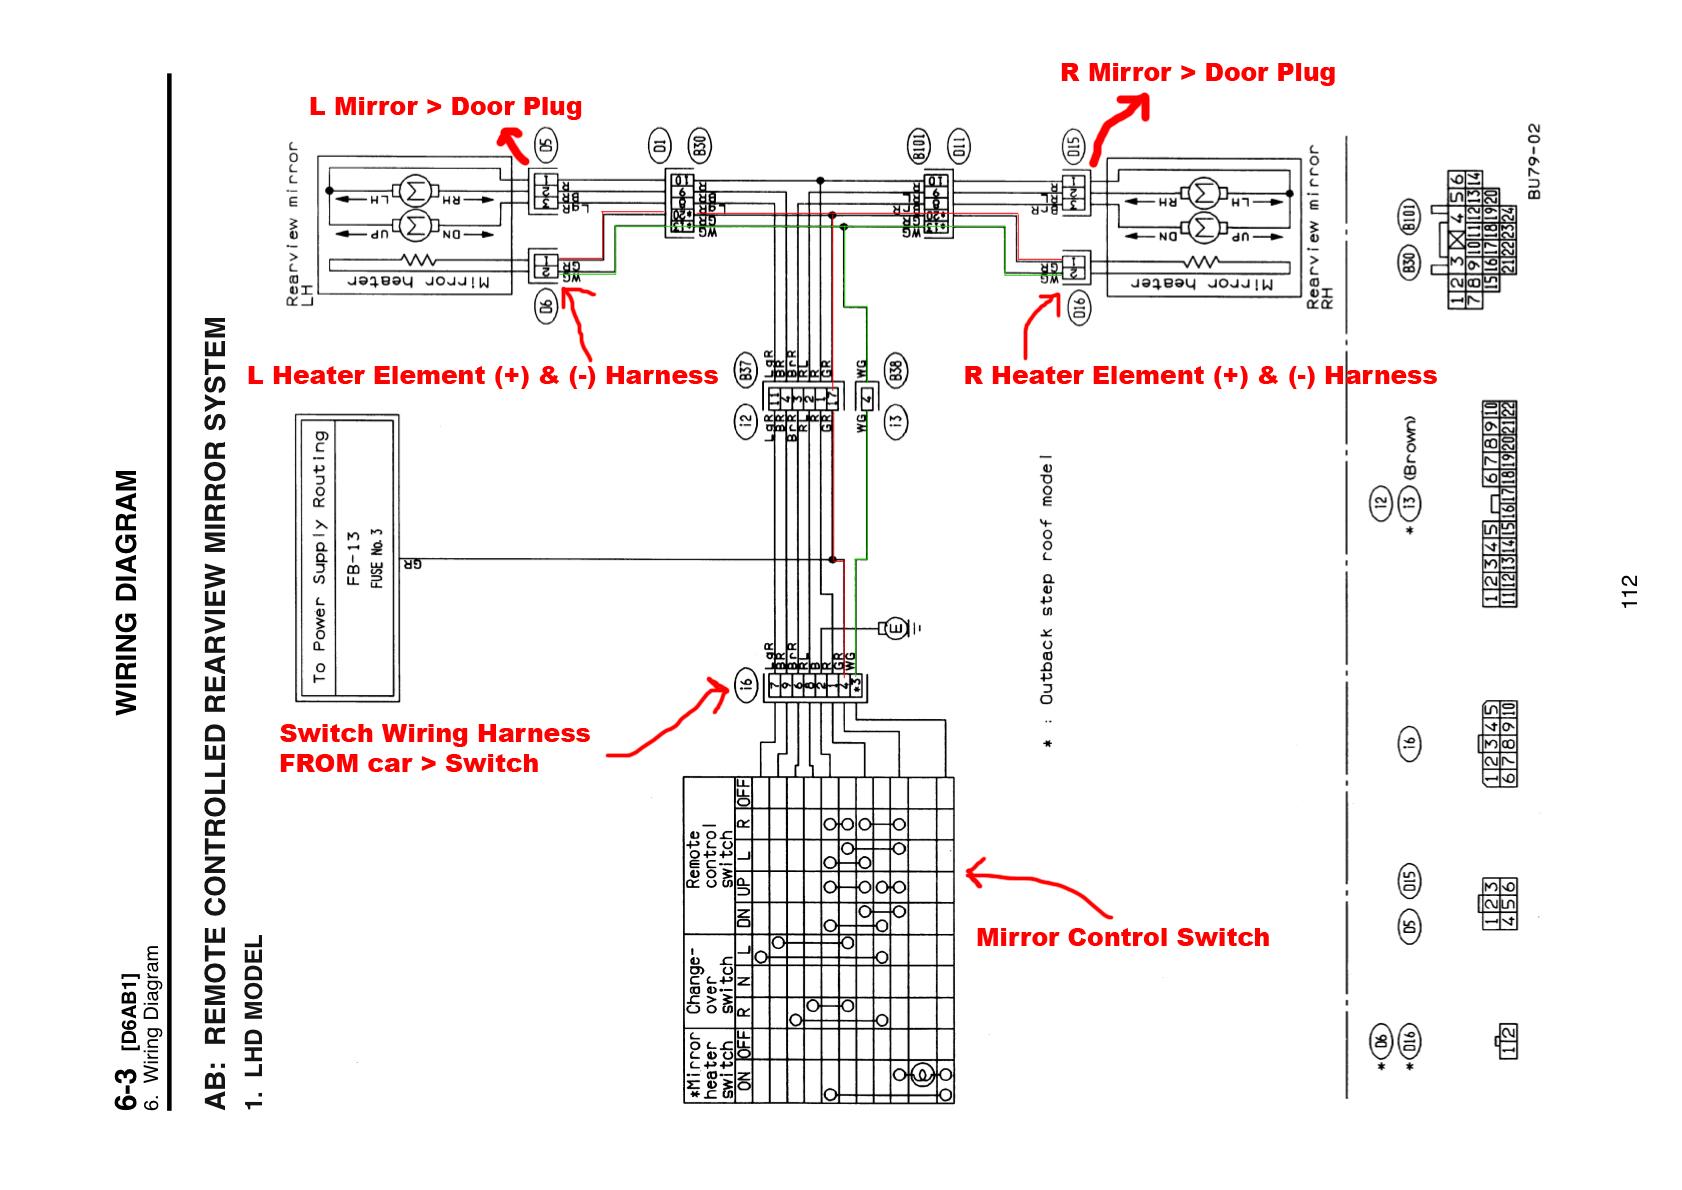 2014 subaru wrx wiring diagram ao 1604  wrx engine diagram 2002 subaru impreza wrx engine free  wrx engine diagram 2002 subaru impreza